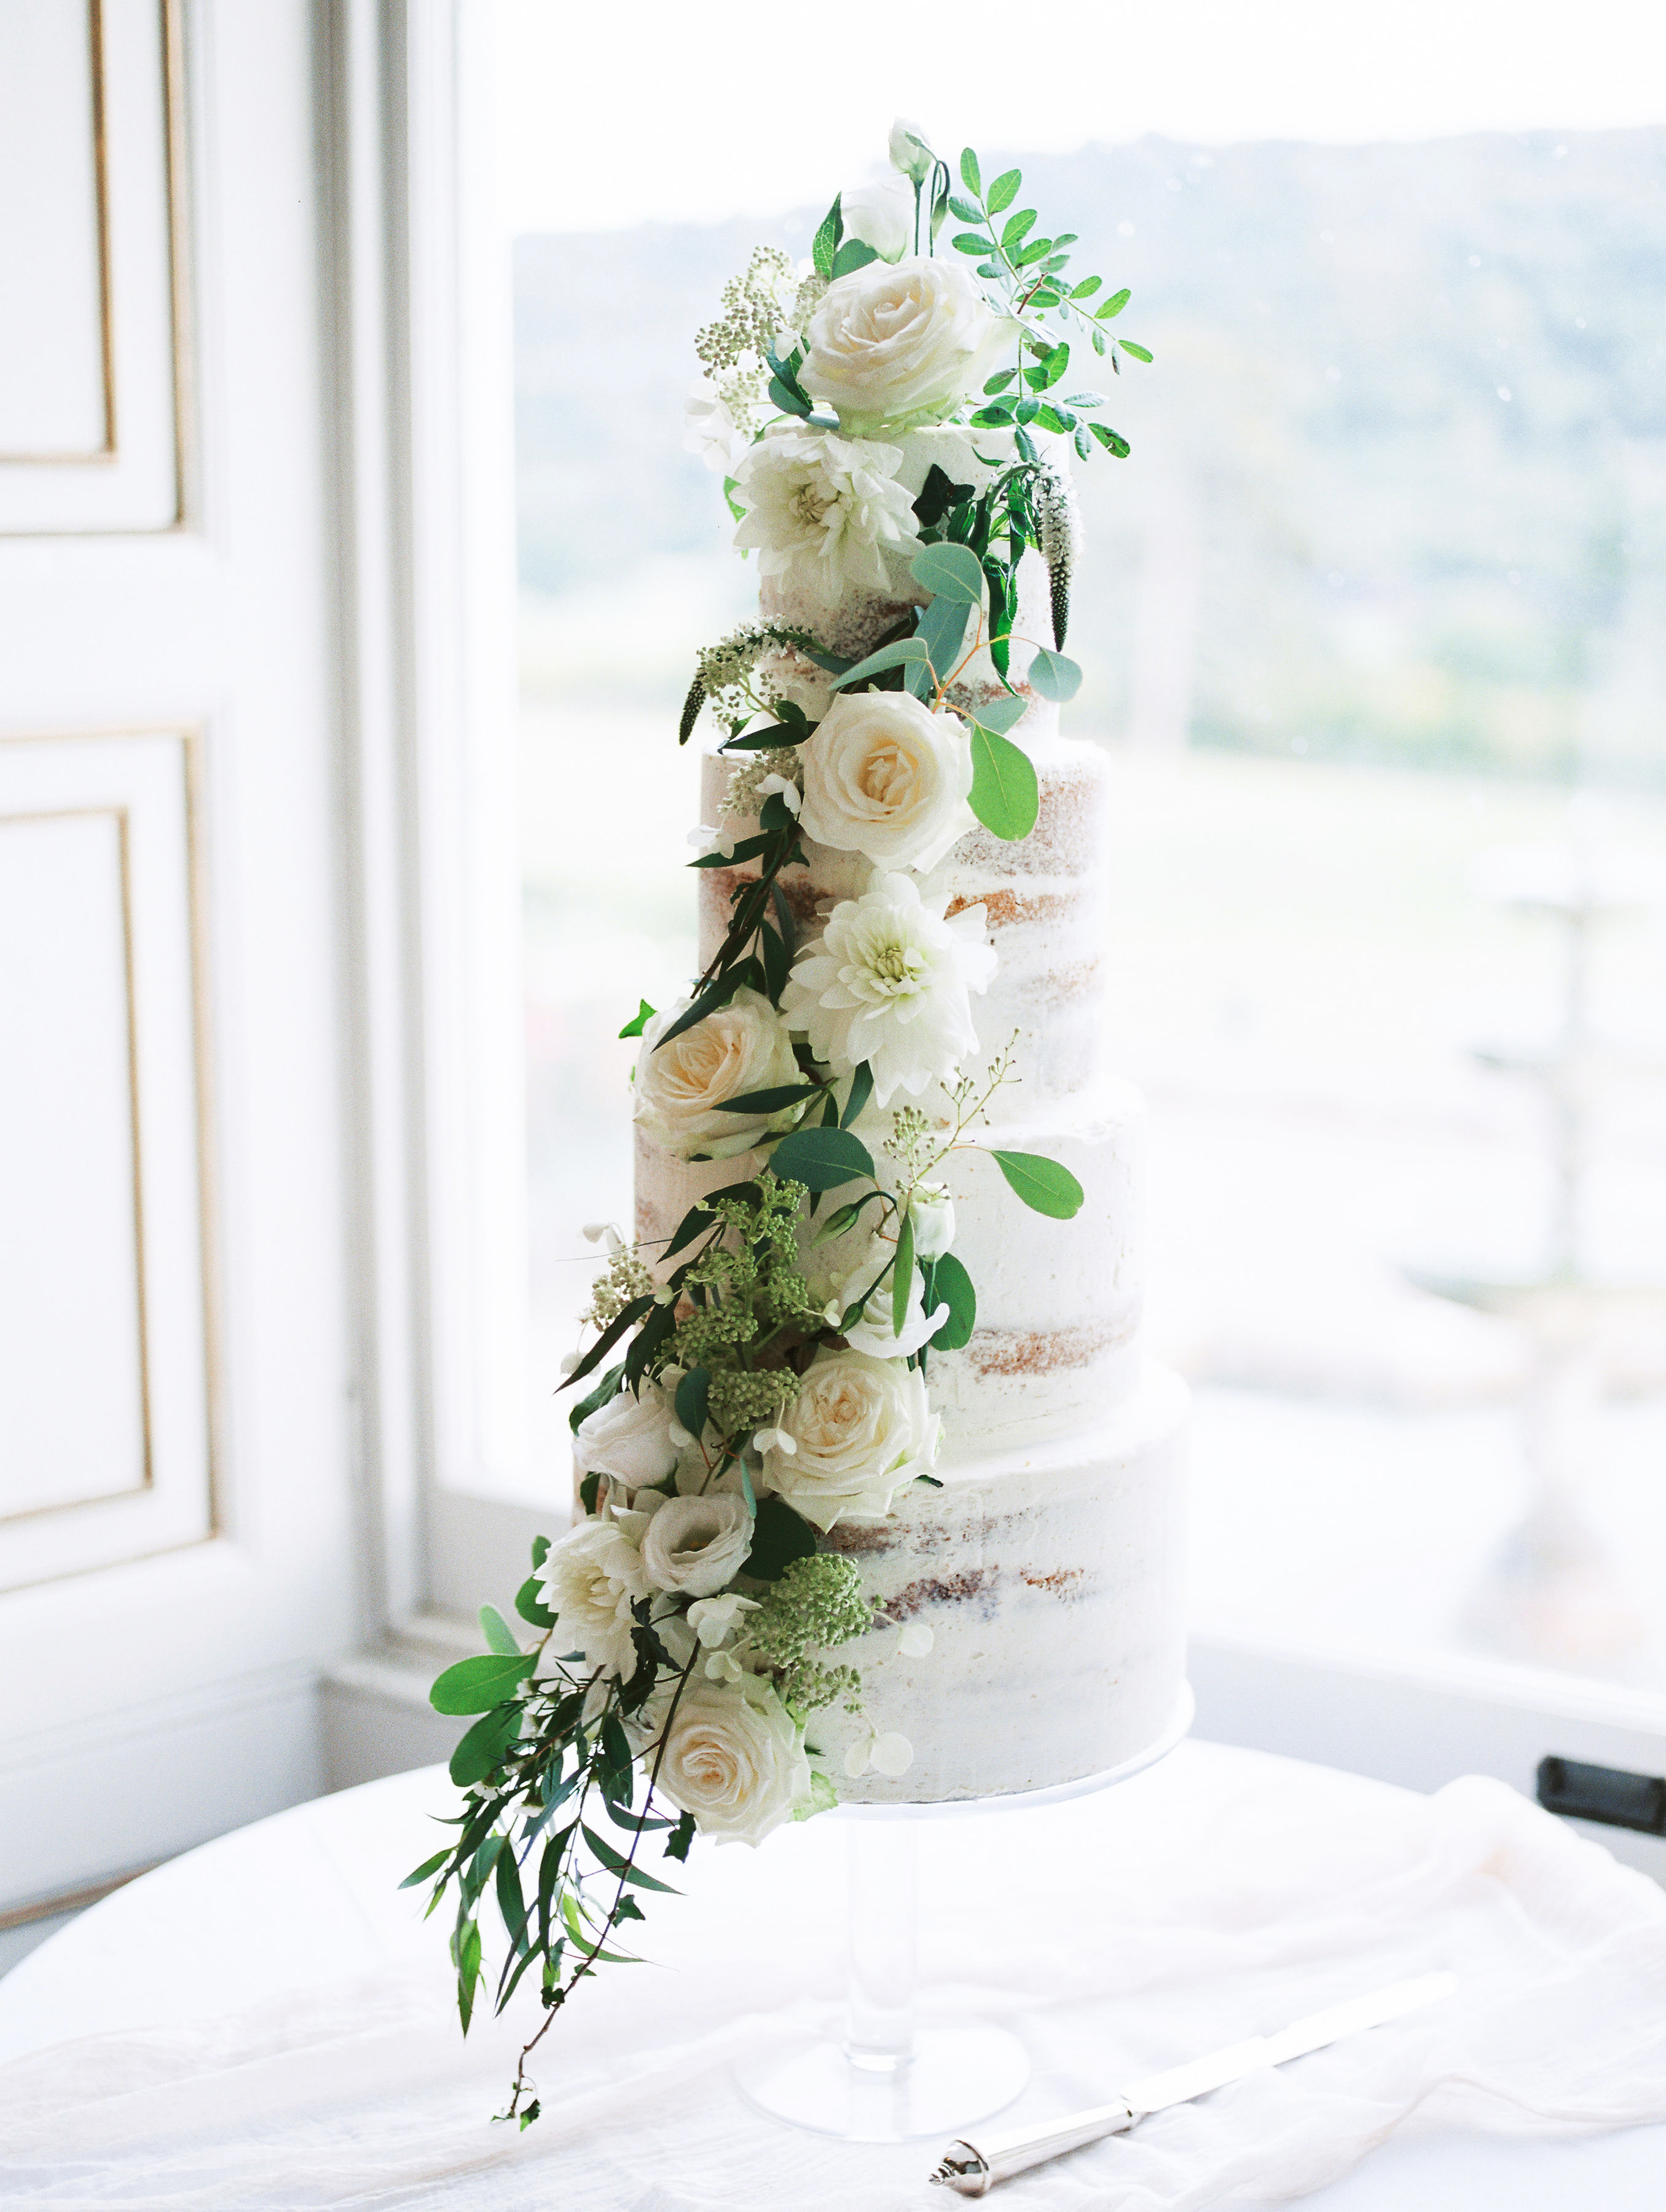 sophie christopher wedding mulit-tiered cake